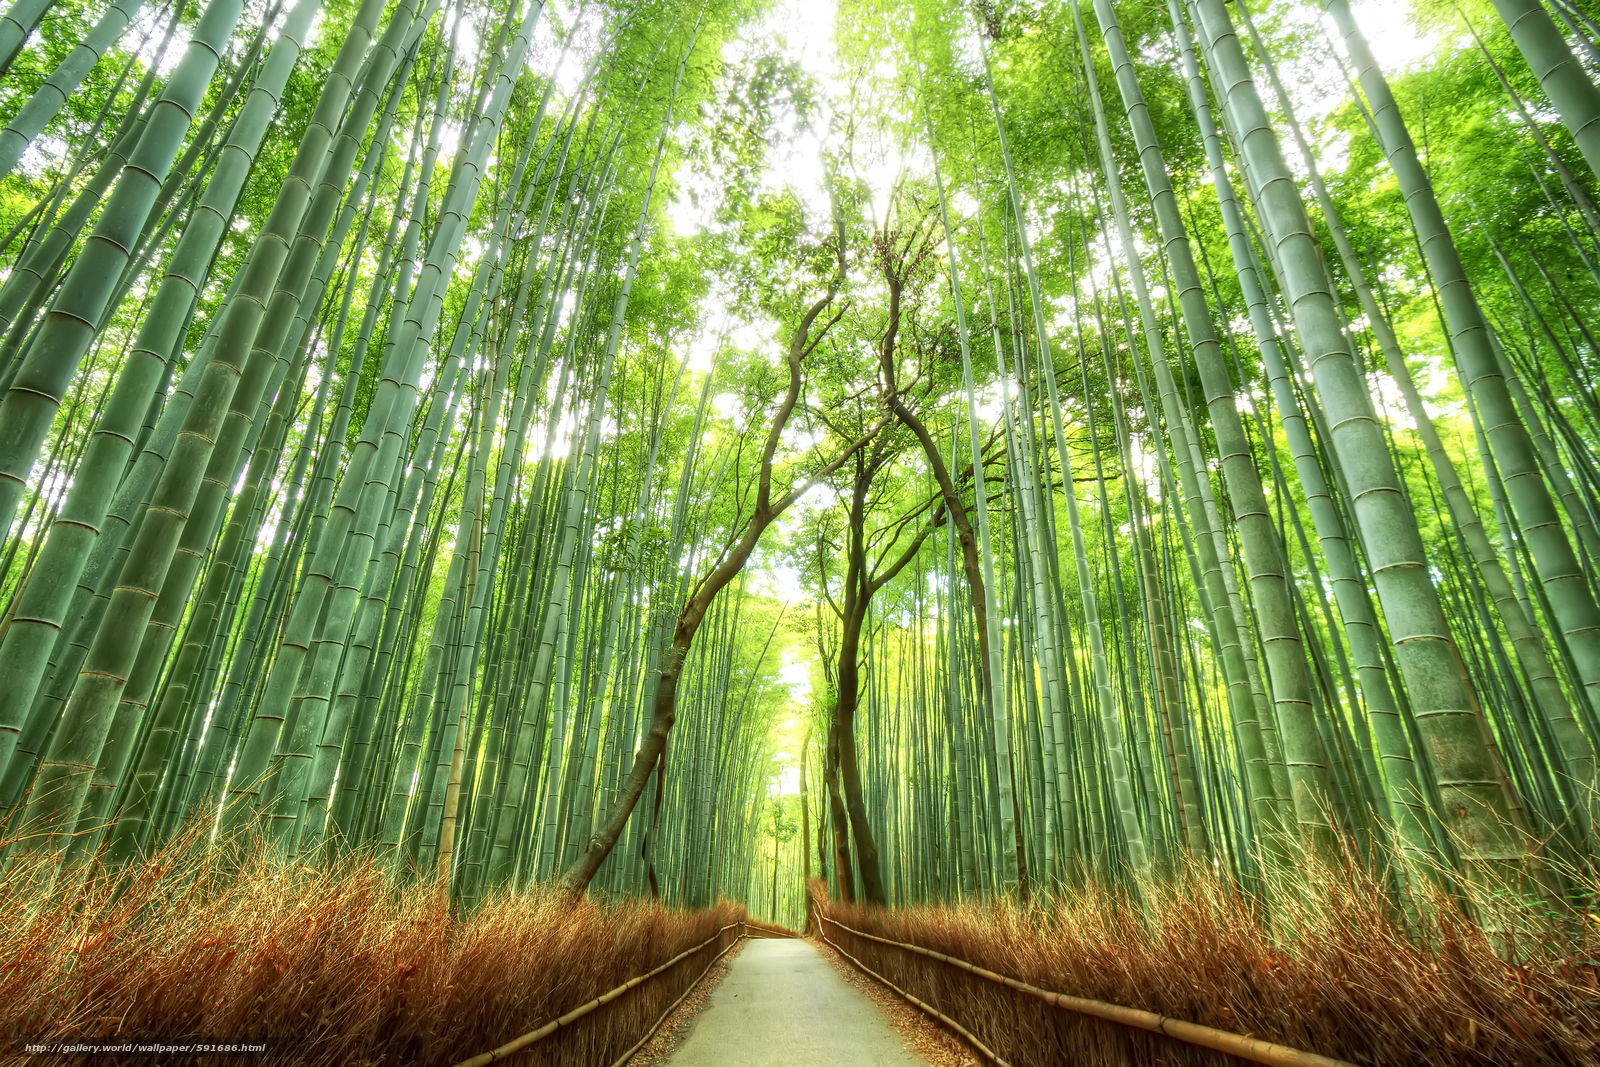 TLOU2 Beautiful Forest HD Desktop Wallpaper Using